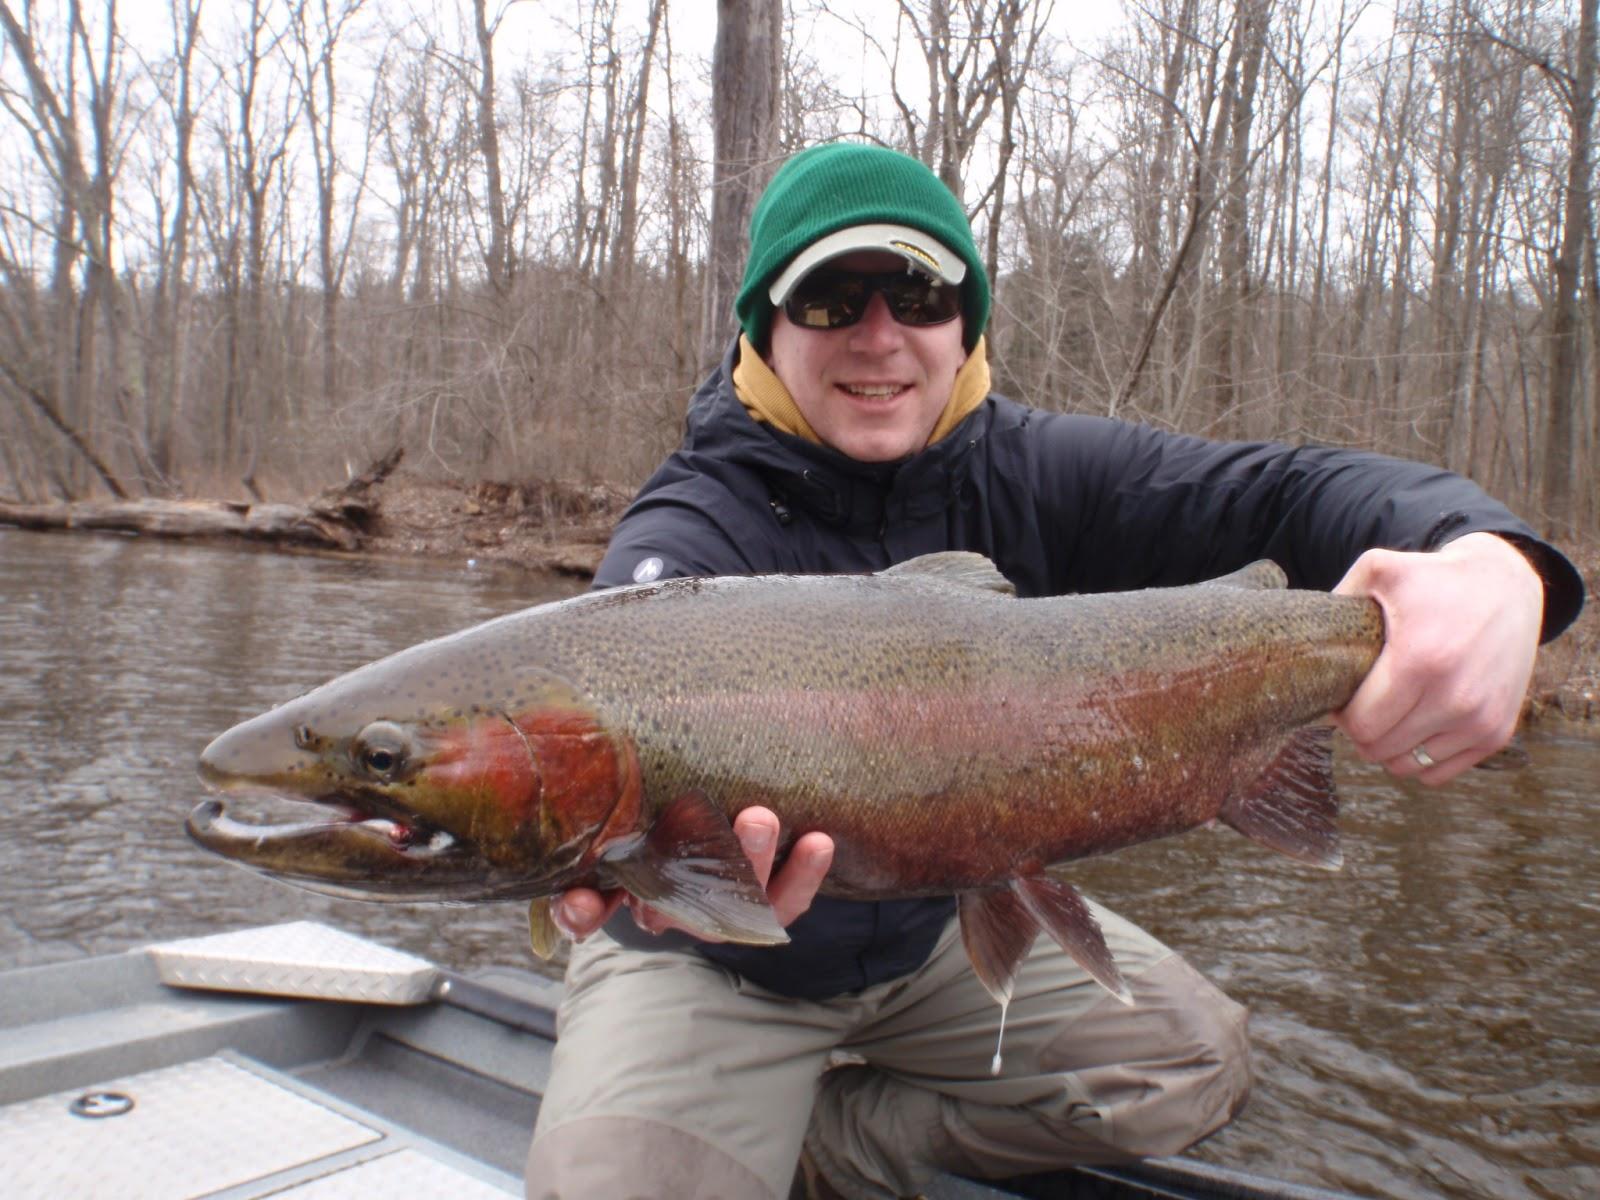 Steelhead fishing the muskegon river in michigan fly for Michigan steelhead fishing